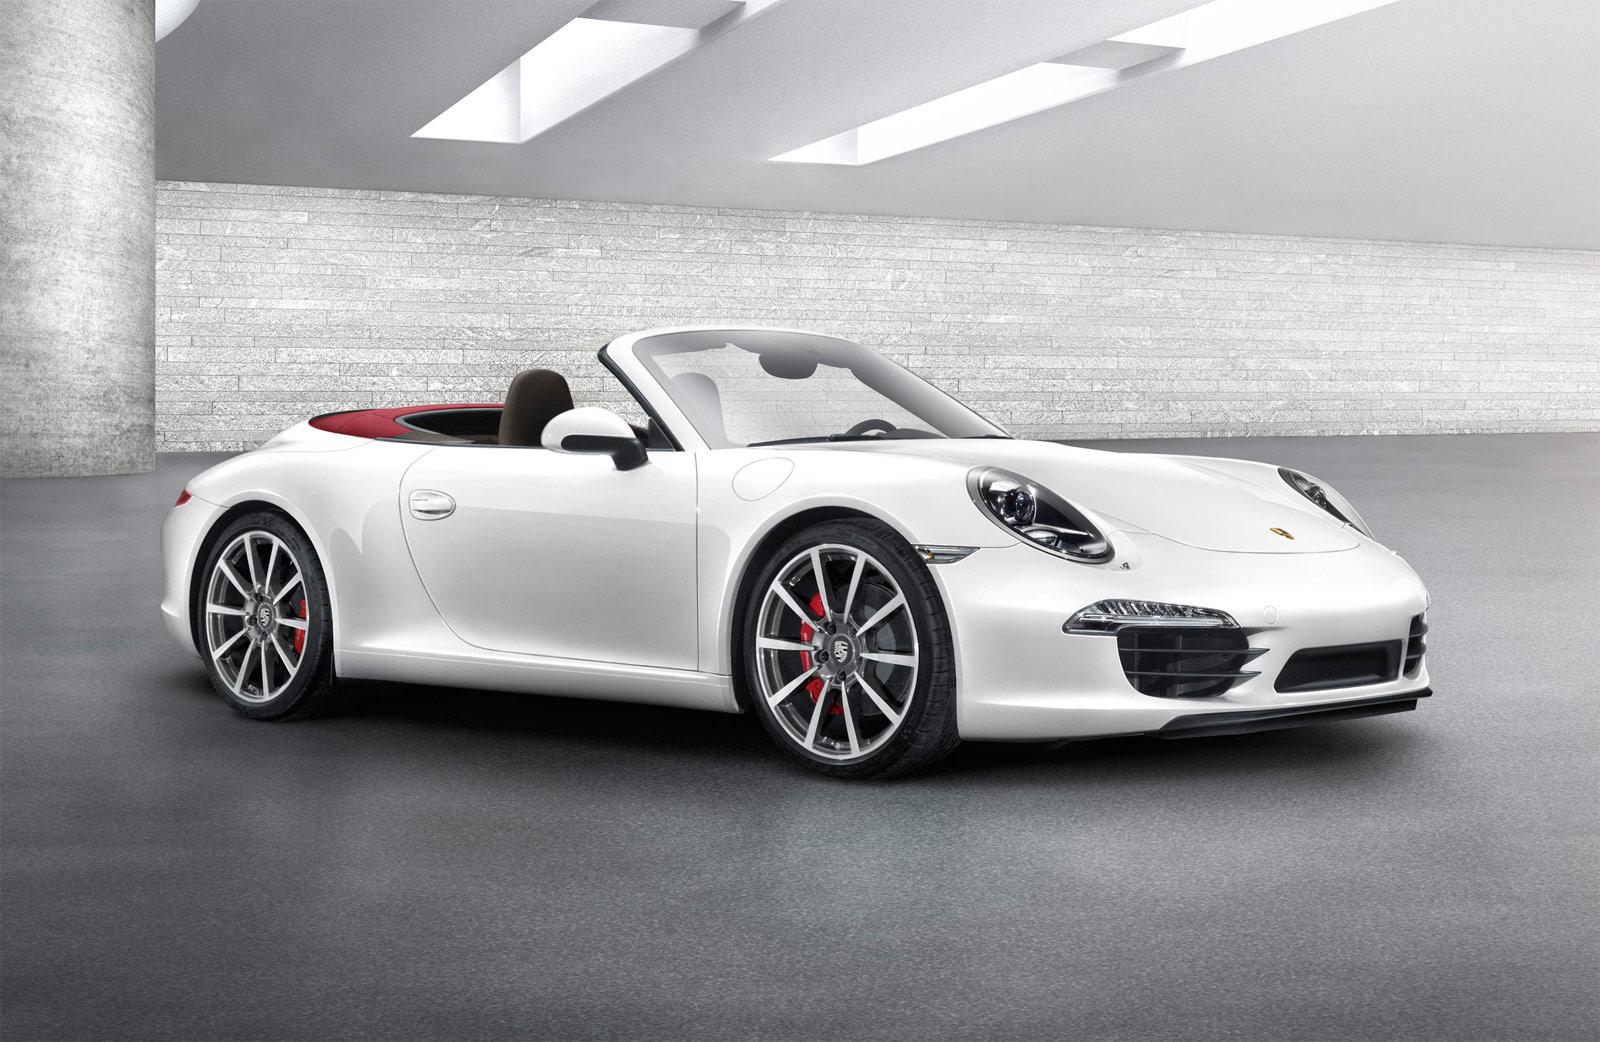 Porche 911 Porsche 911 Carrera S Cabriolet Customer Review Mouthshut Com